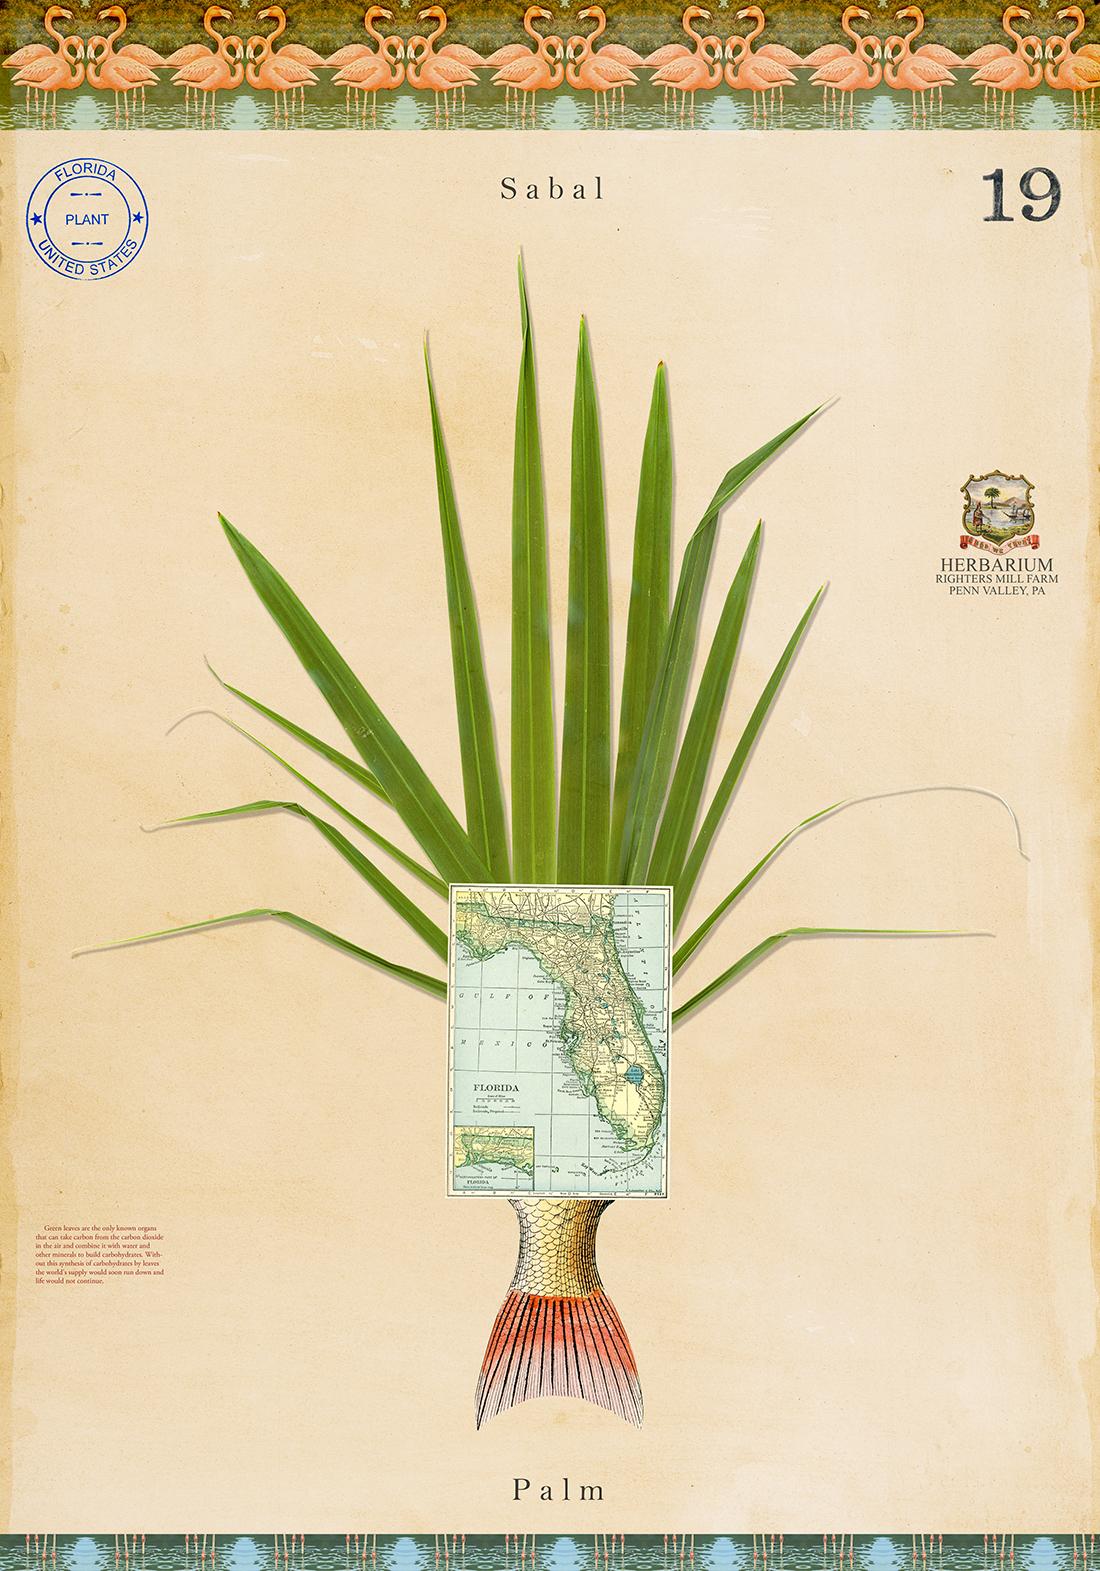 Sabal Palm with Map - 20x14